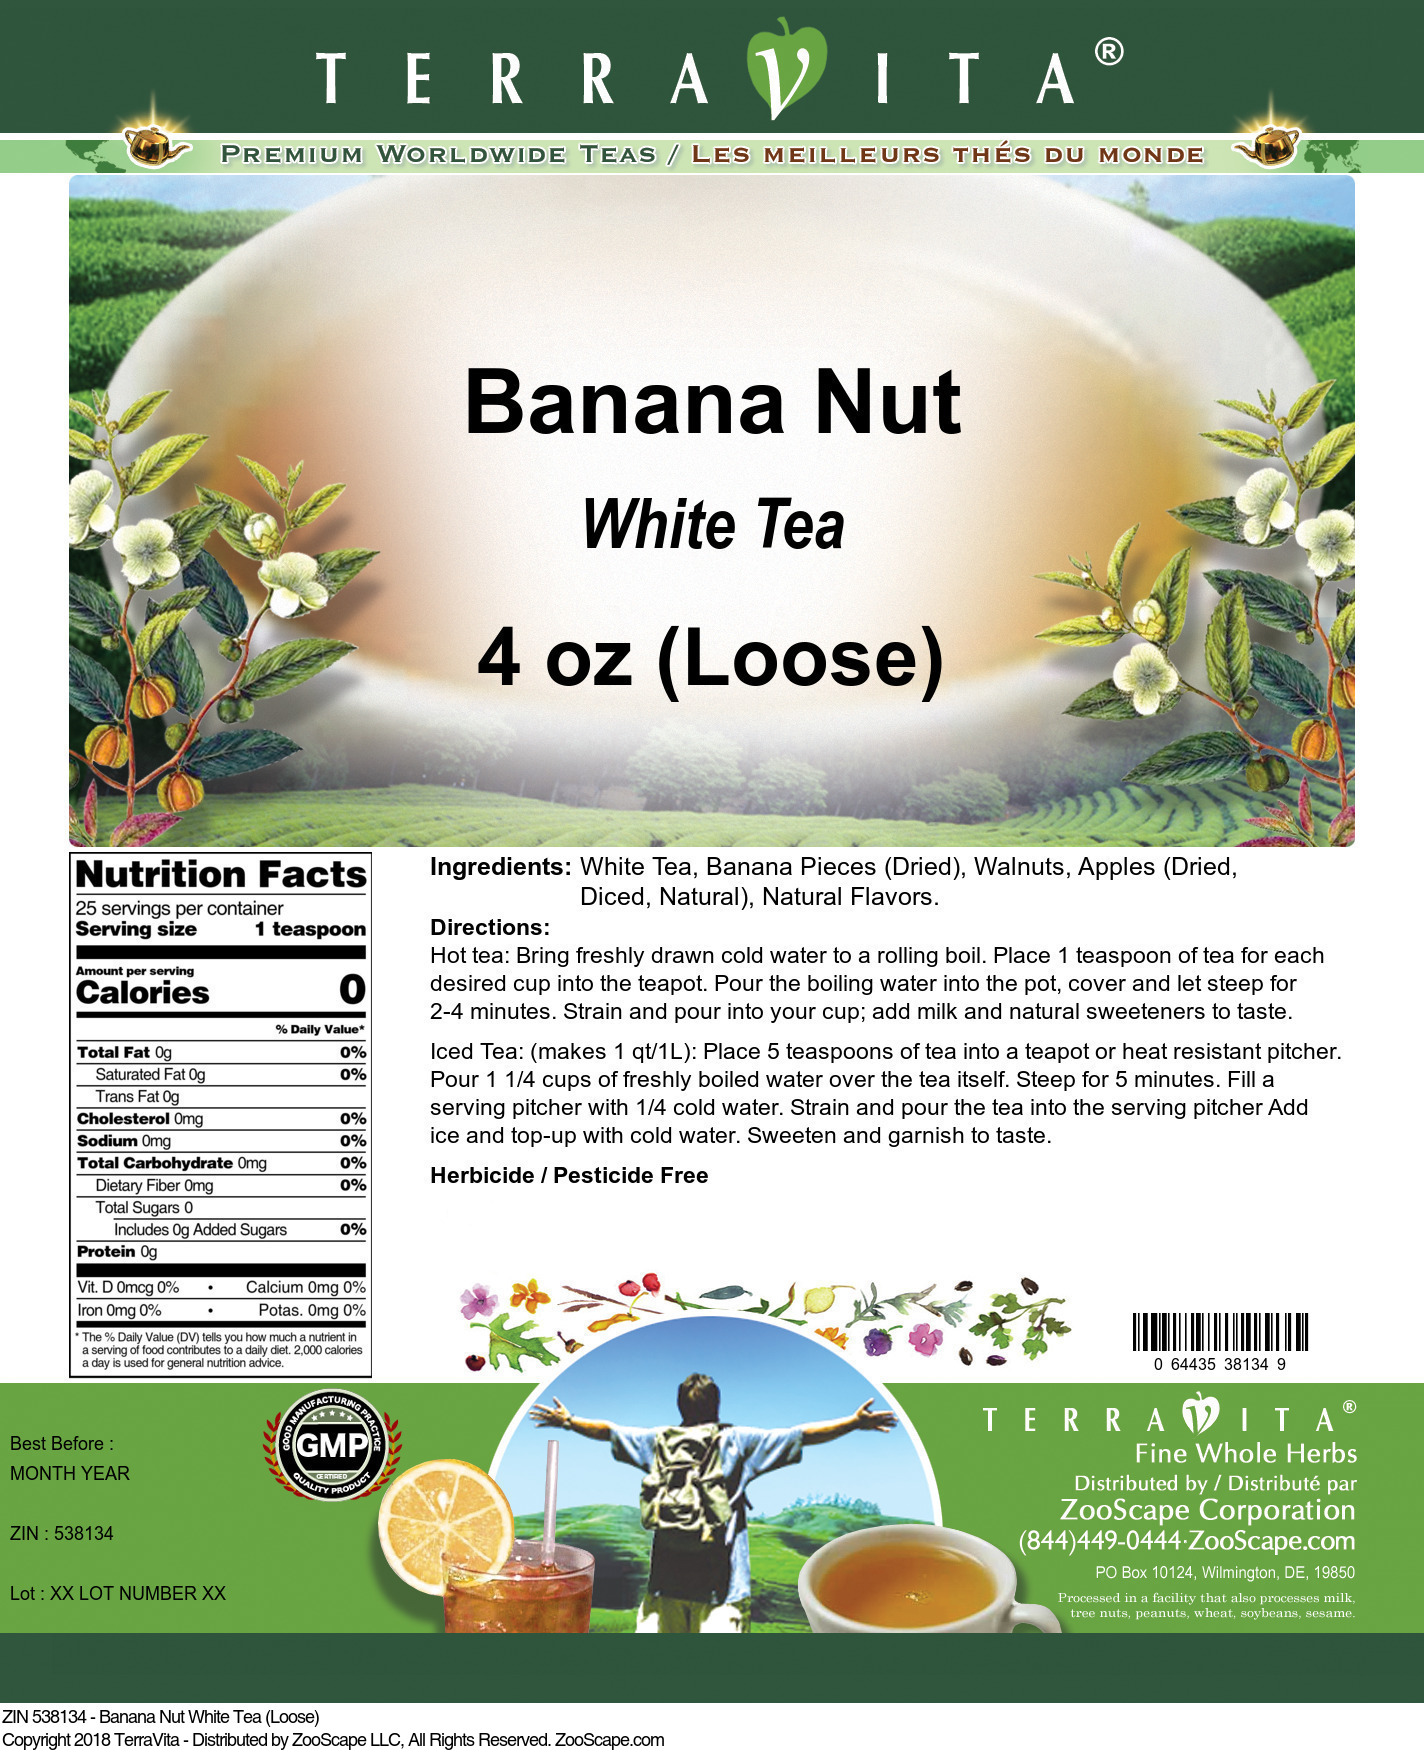 Banana Nut White Tea (Loose)